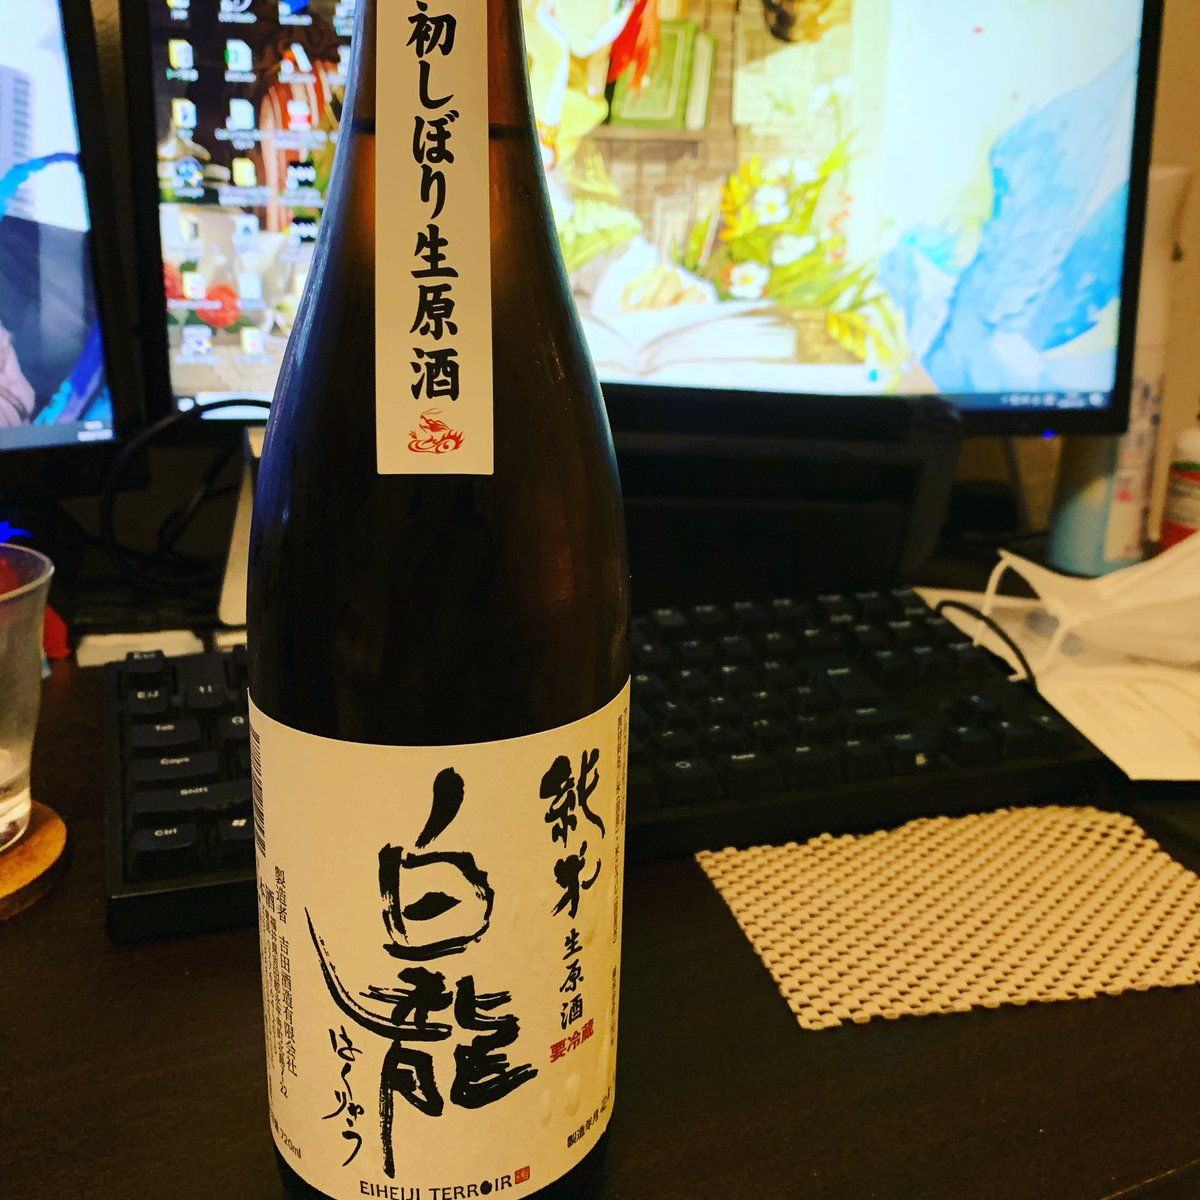 test ツイッターメディア - 今週も無事仕事終わり! 今回は福井の吉田酒造の初しぼり生原酒! 酒蔵が自分のところで米も造ってるらしい(売り場に来てる方が言ってた) 地味にPARCOの日本酒コーナー季節毎に売ってるものを変えているところが良い。 https://t.co/mQ4u9vHX4W